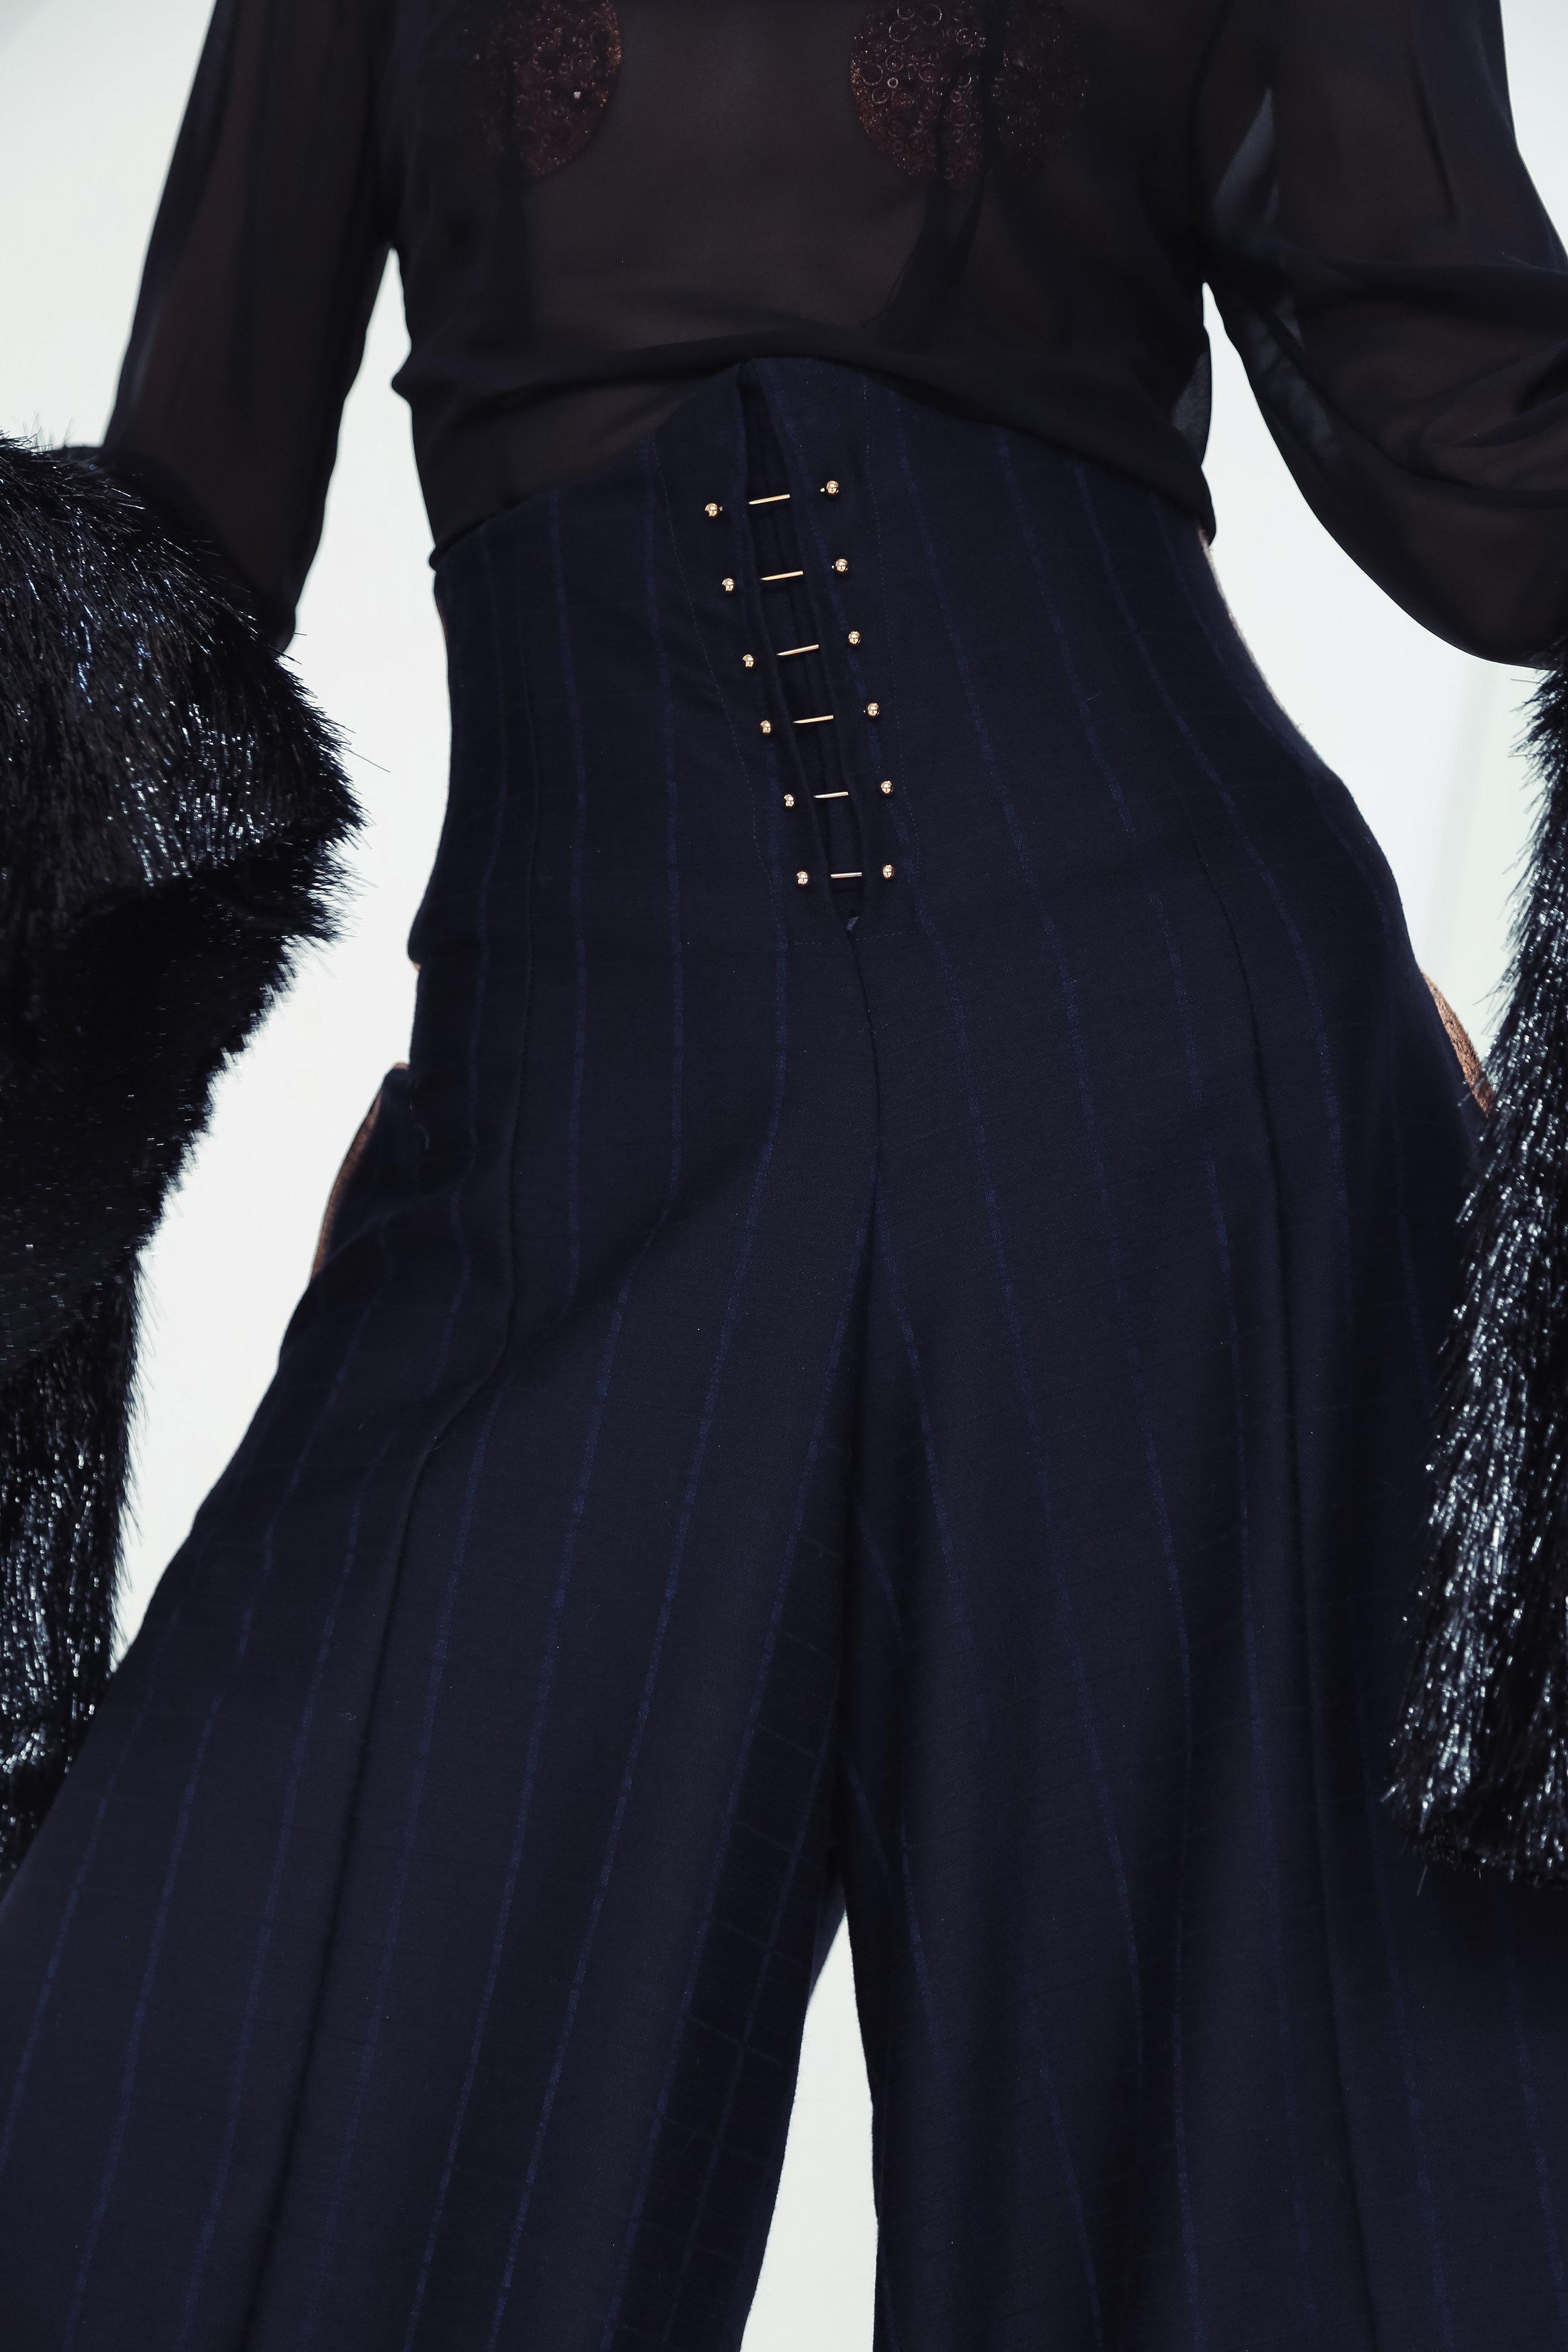 Marlene-Trouser-High-Waist-Piercing Kopie.jpg